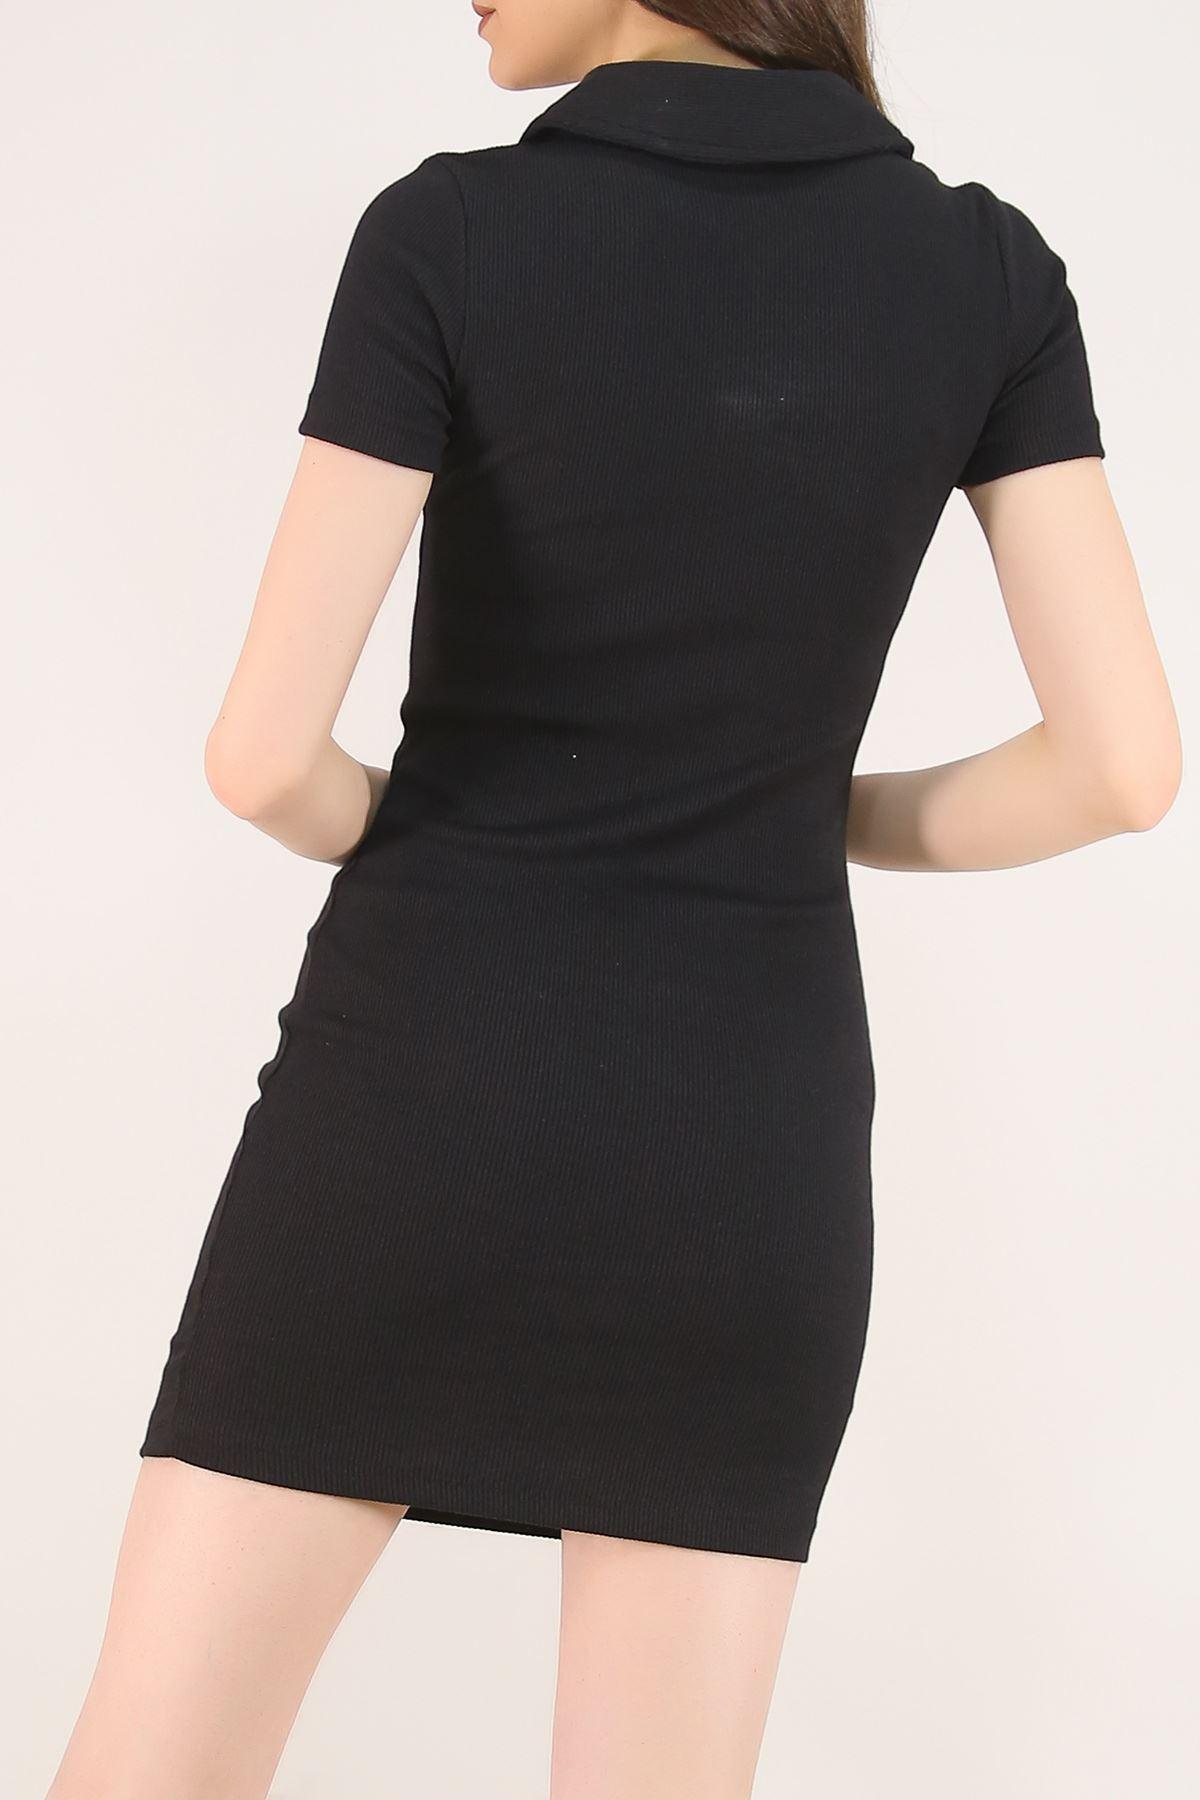 Kaşkorse Yakalı Elbise Siyah - 2392.159.